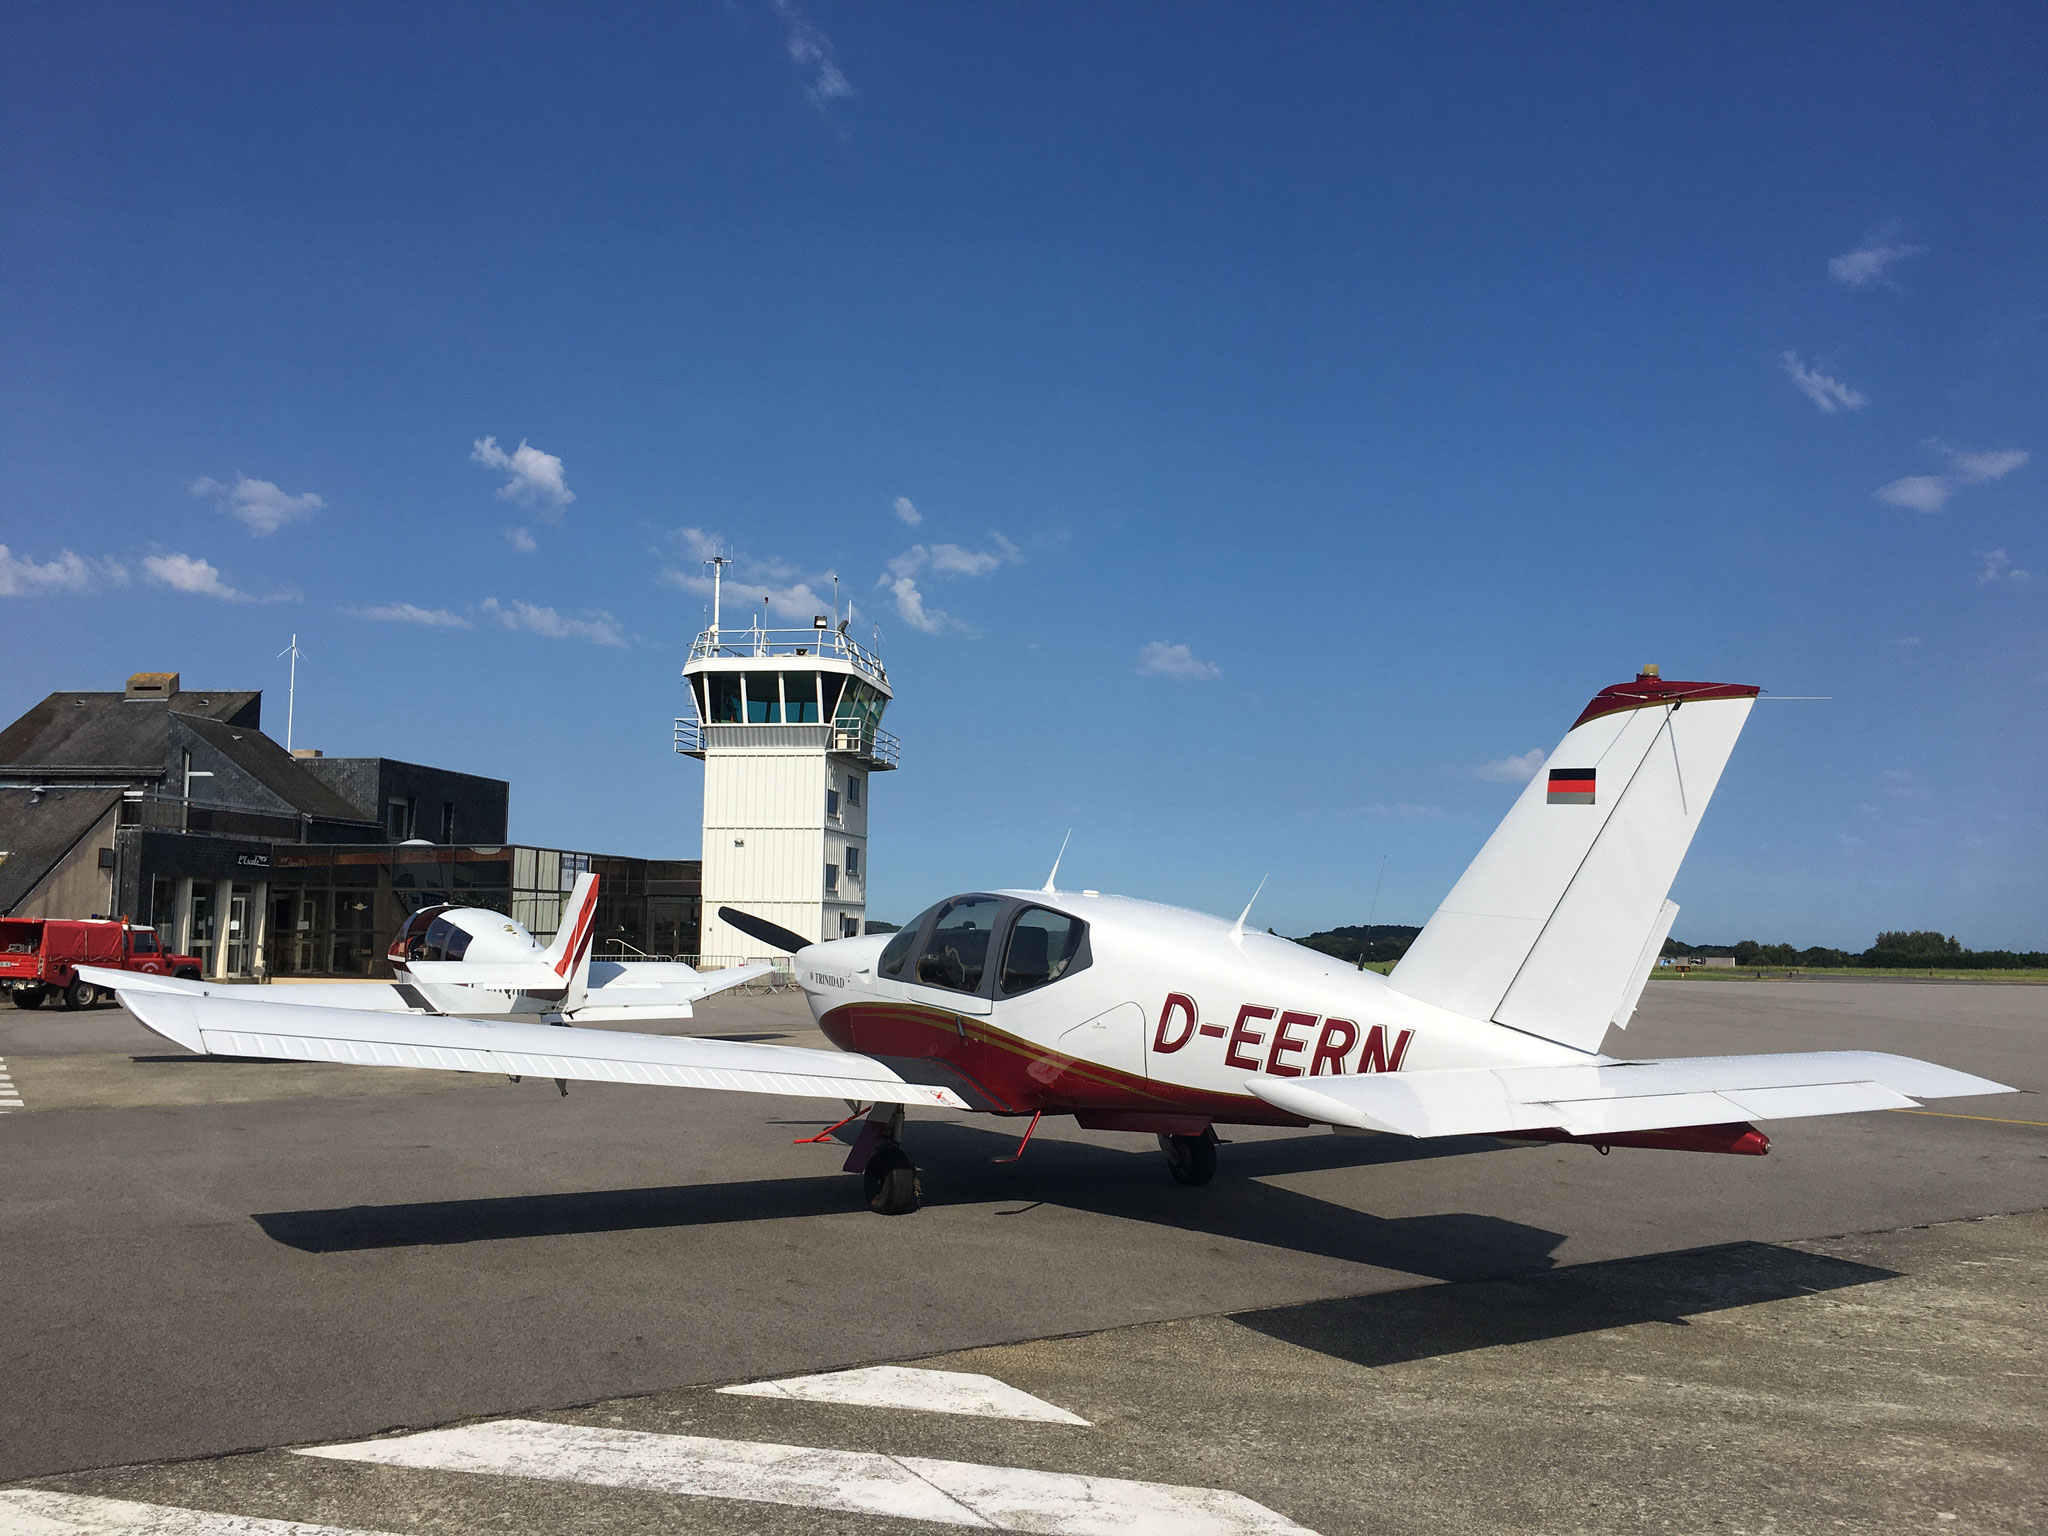 L'aérodrome de Morlaix